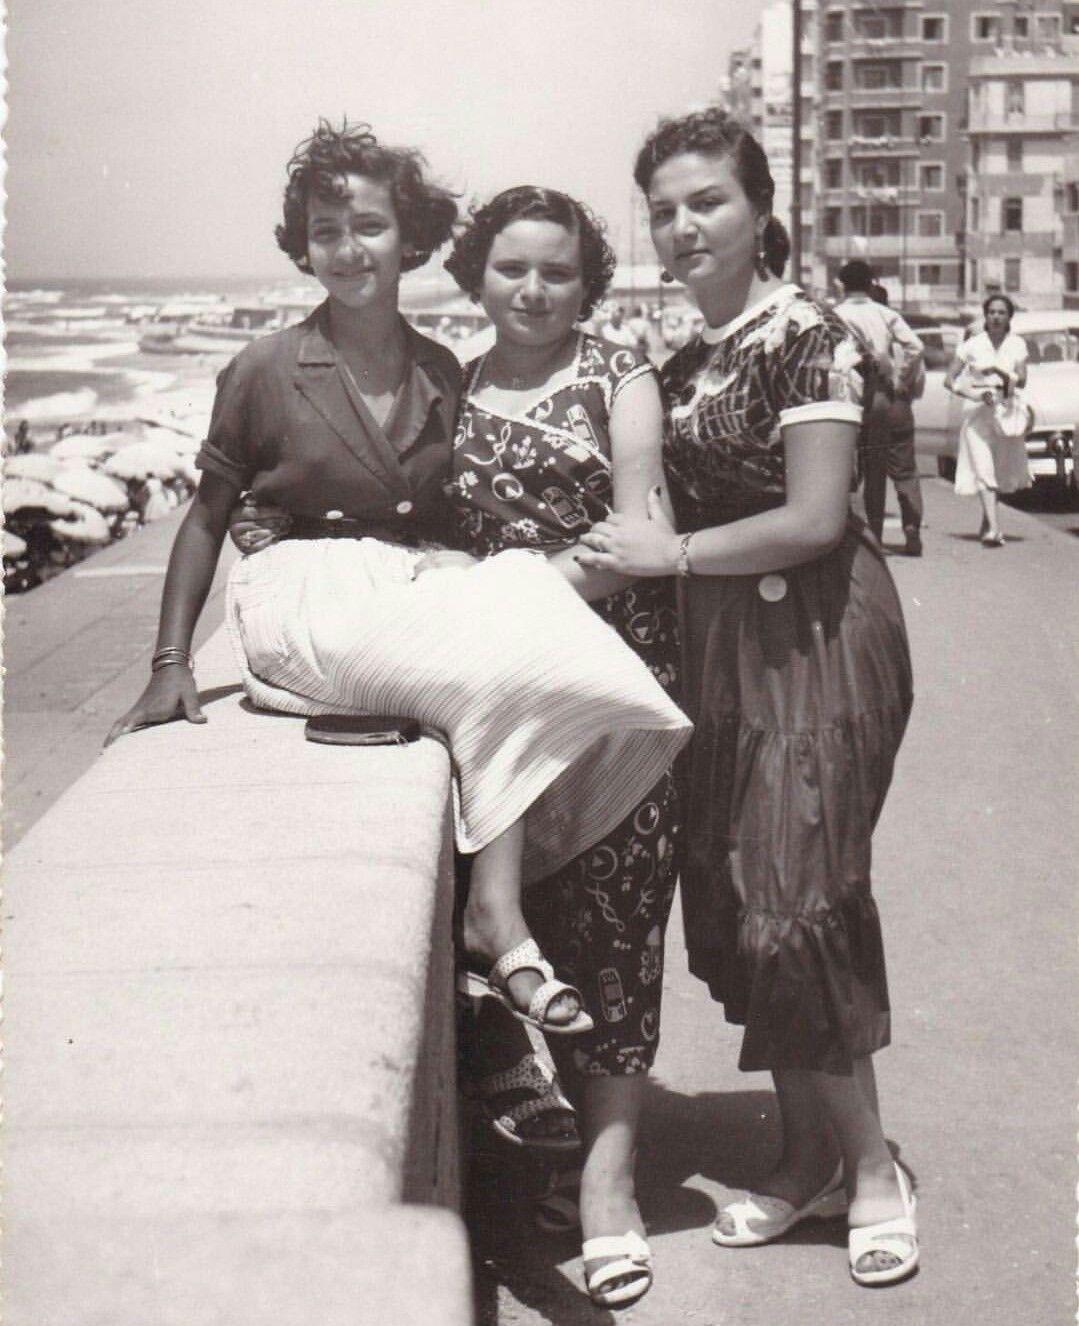 Women of the Fifties